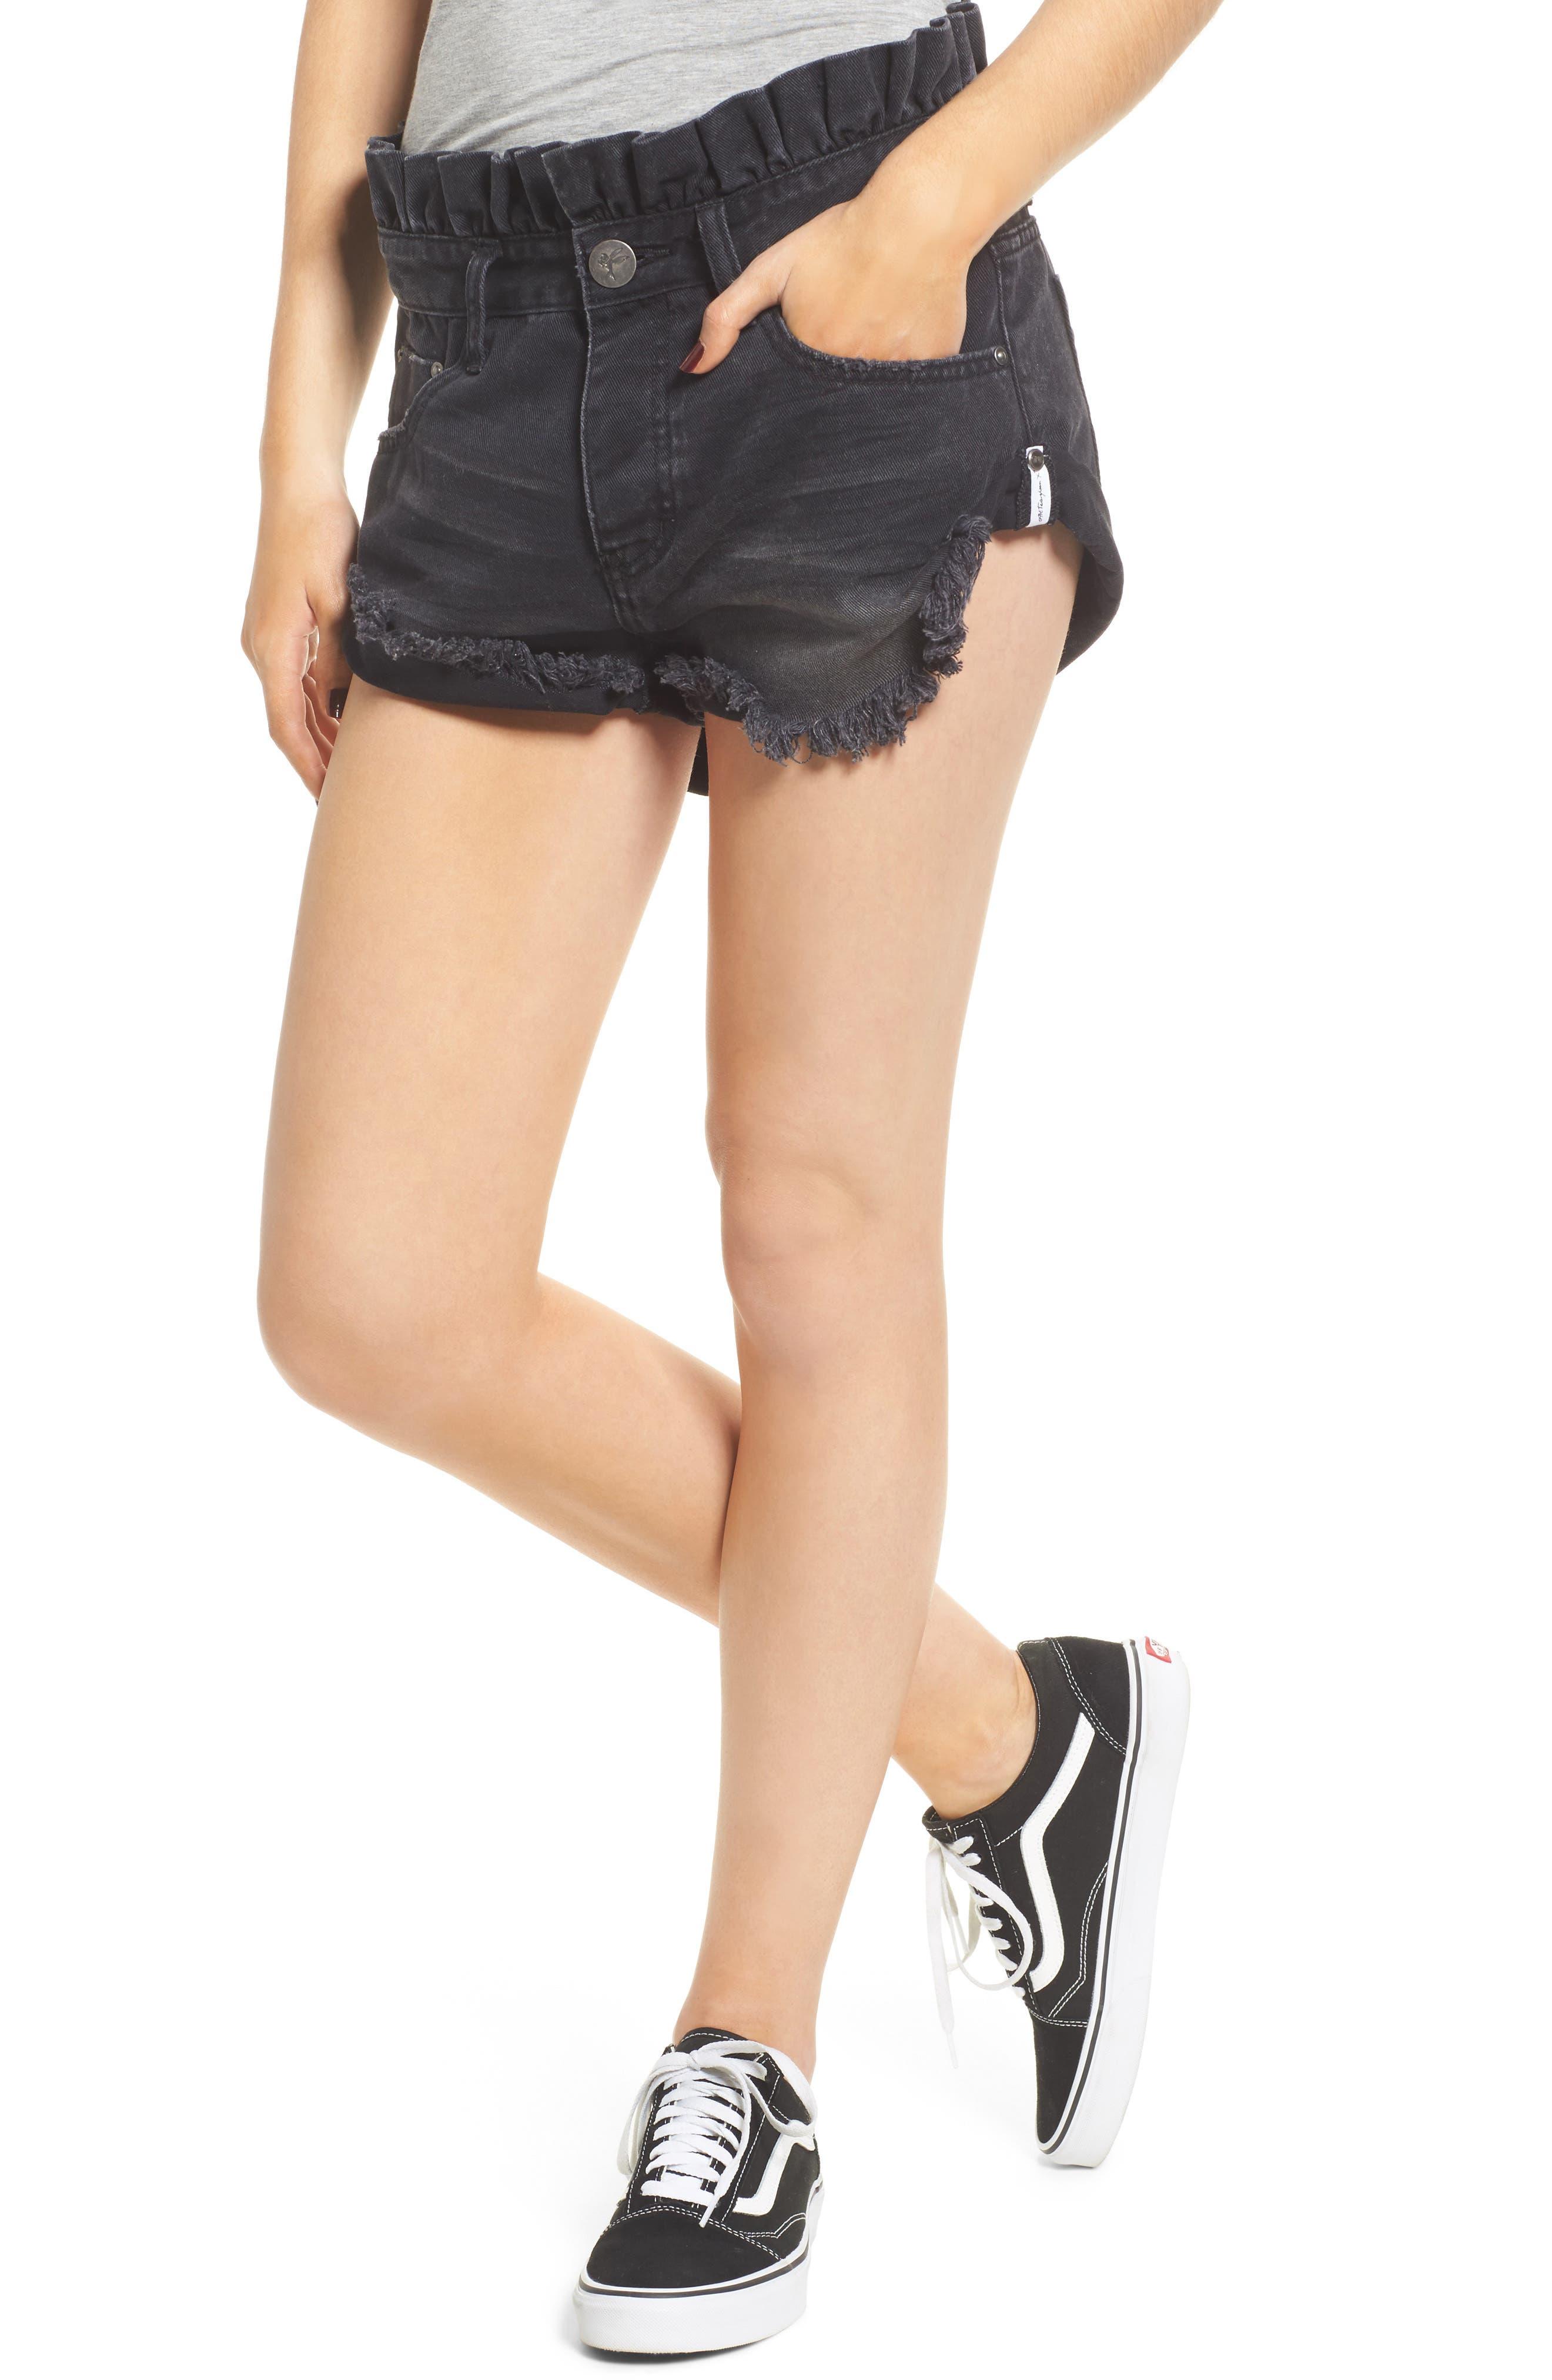 One Teaspoon Le Bandits Denim Shorts (Black Anchor)